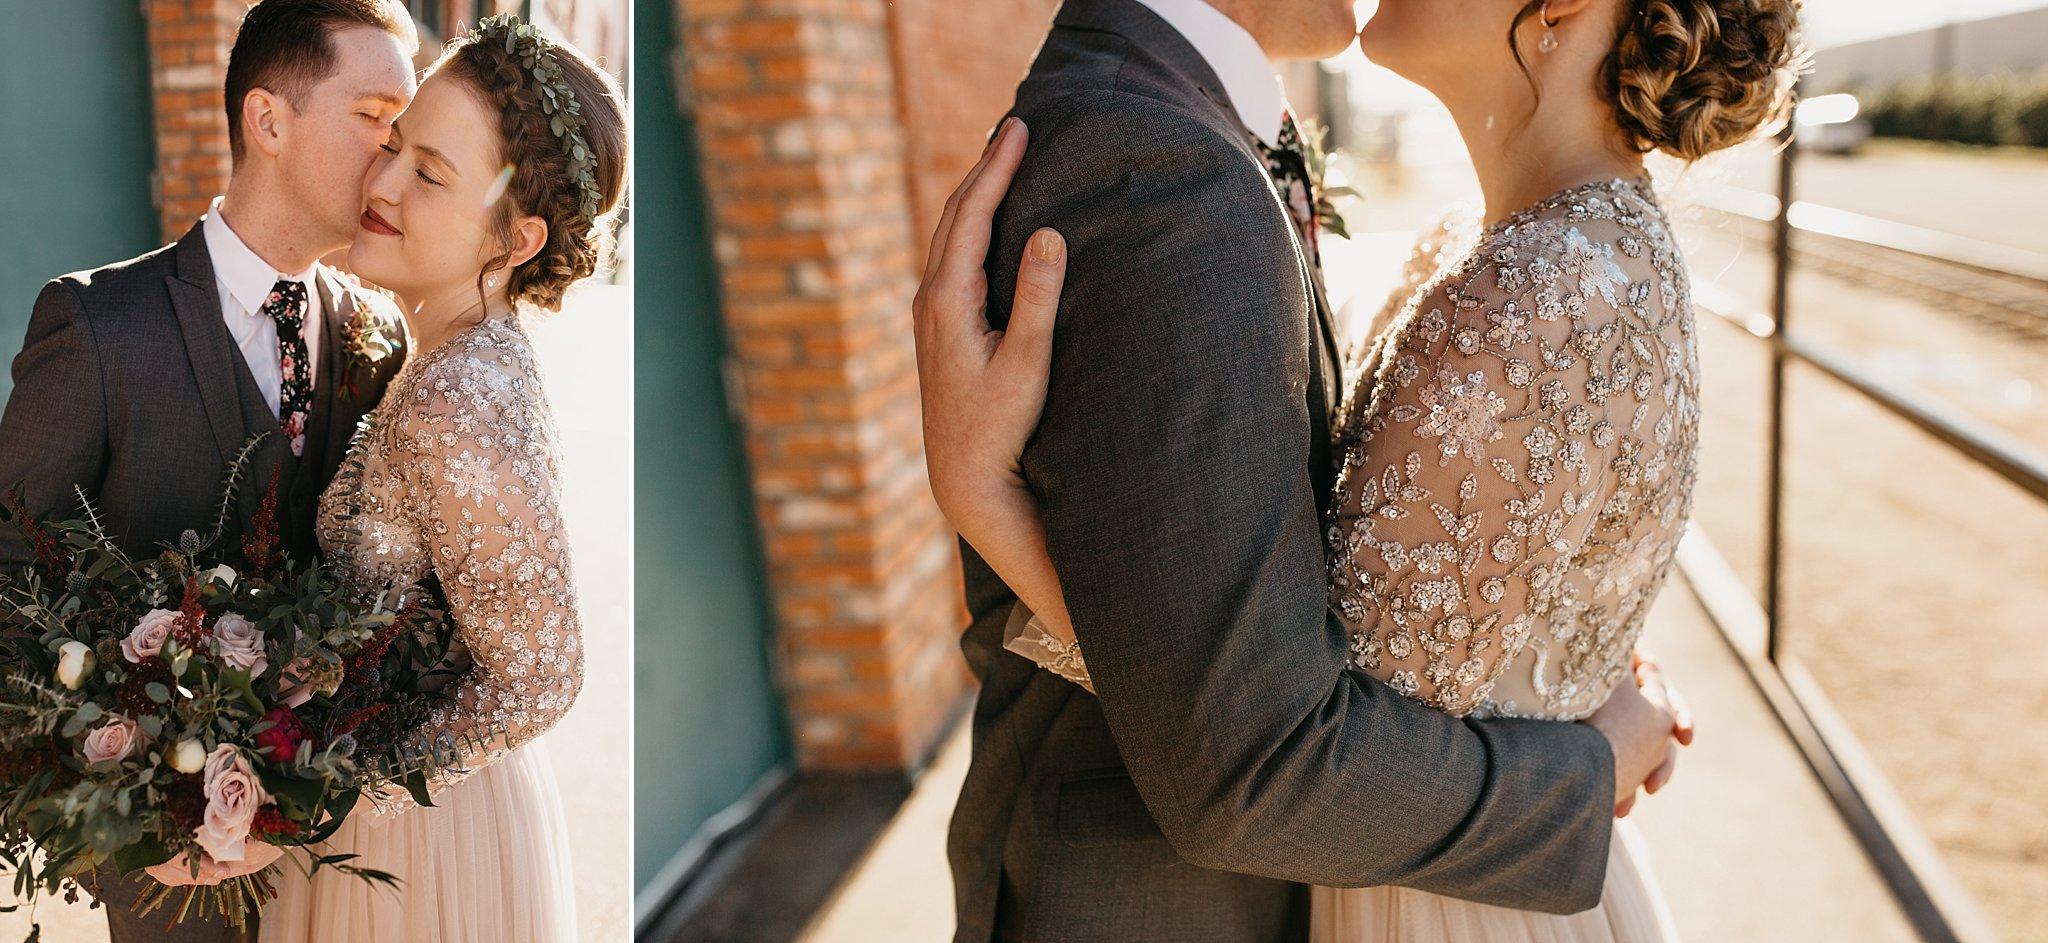 Wilderlove Co_Waco Texas_The Phoenix_Romantic Wedding Photography_0038.jpg